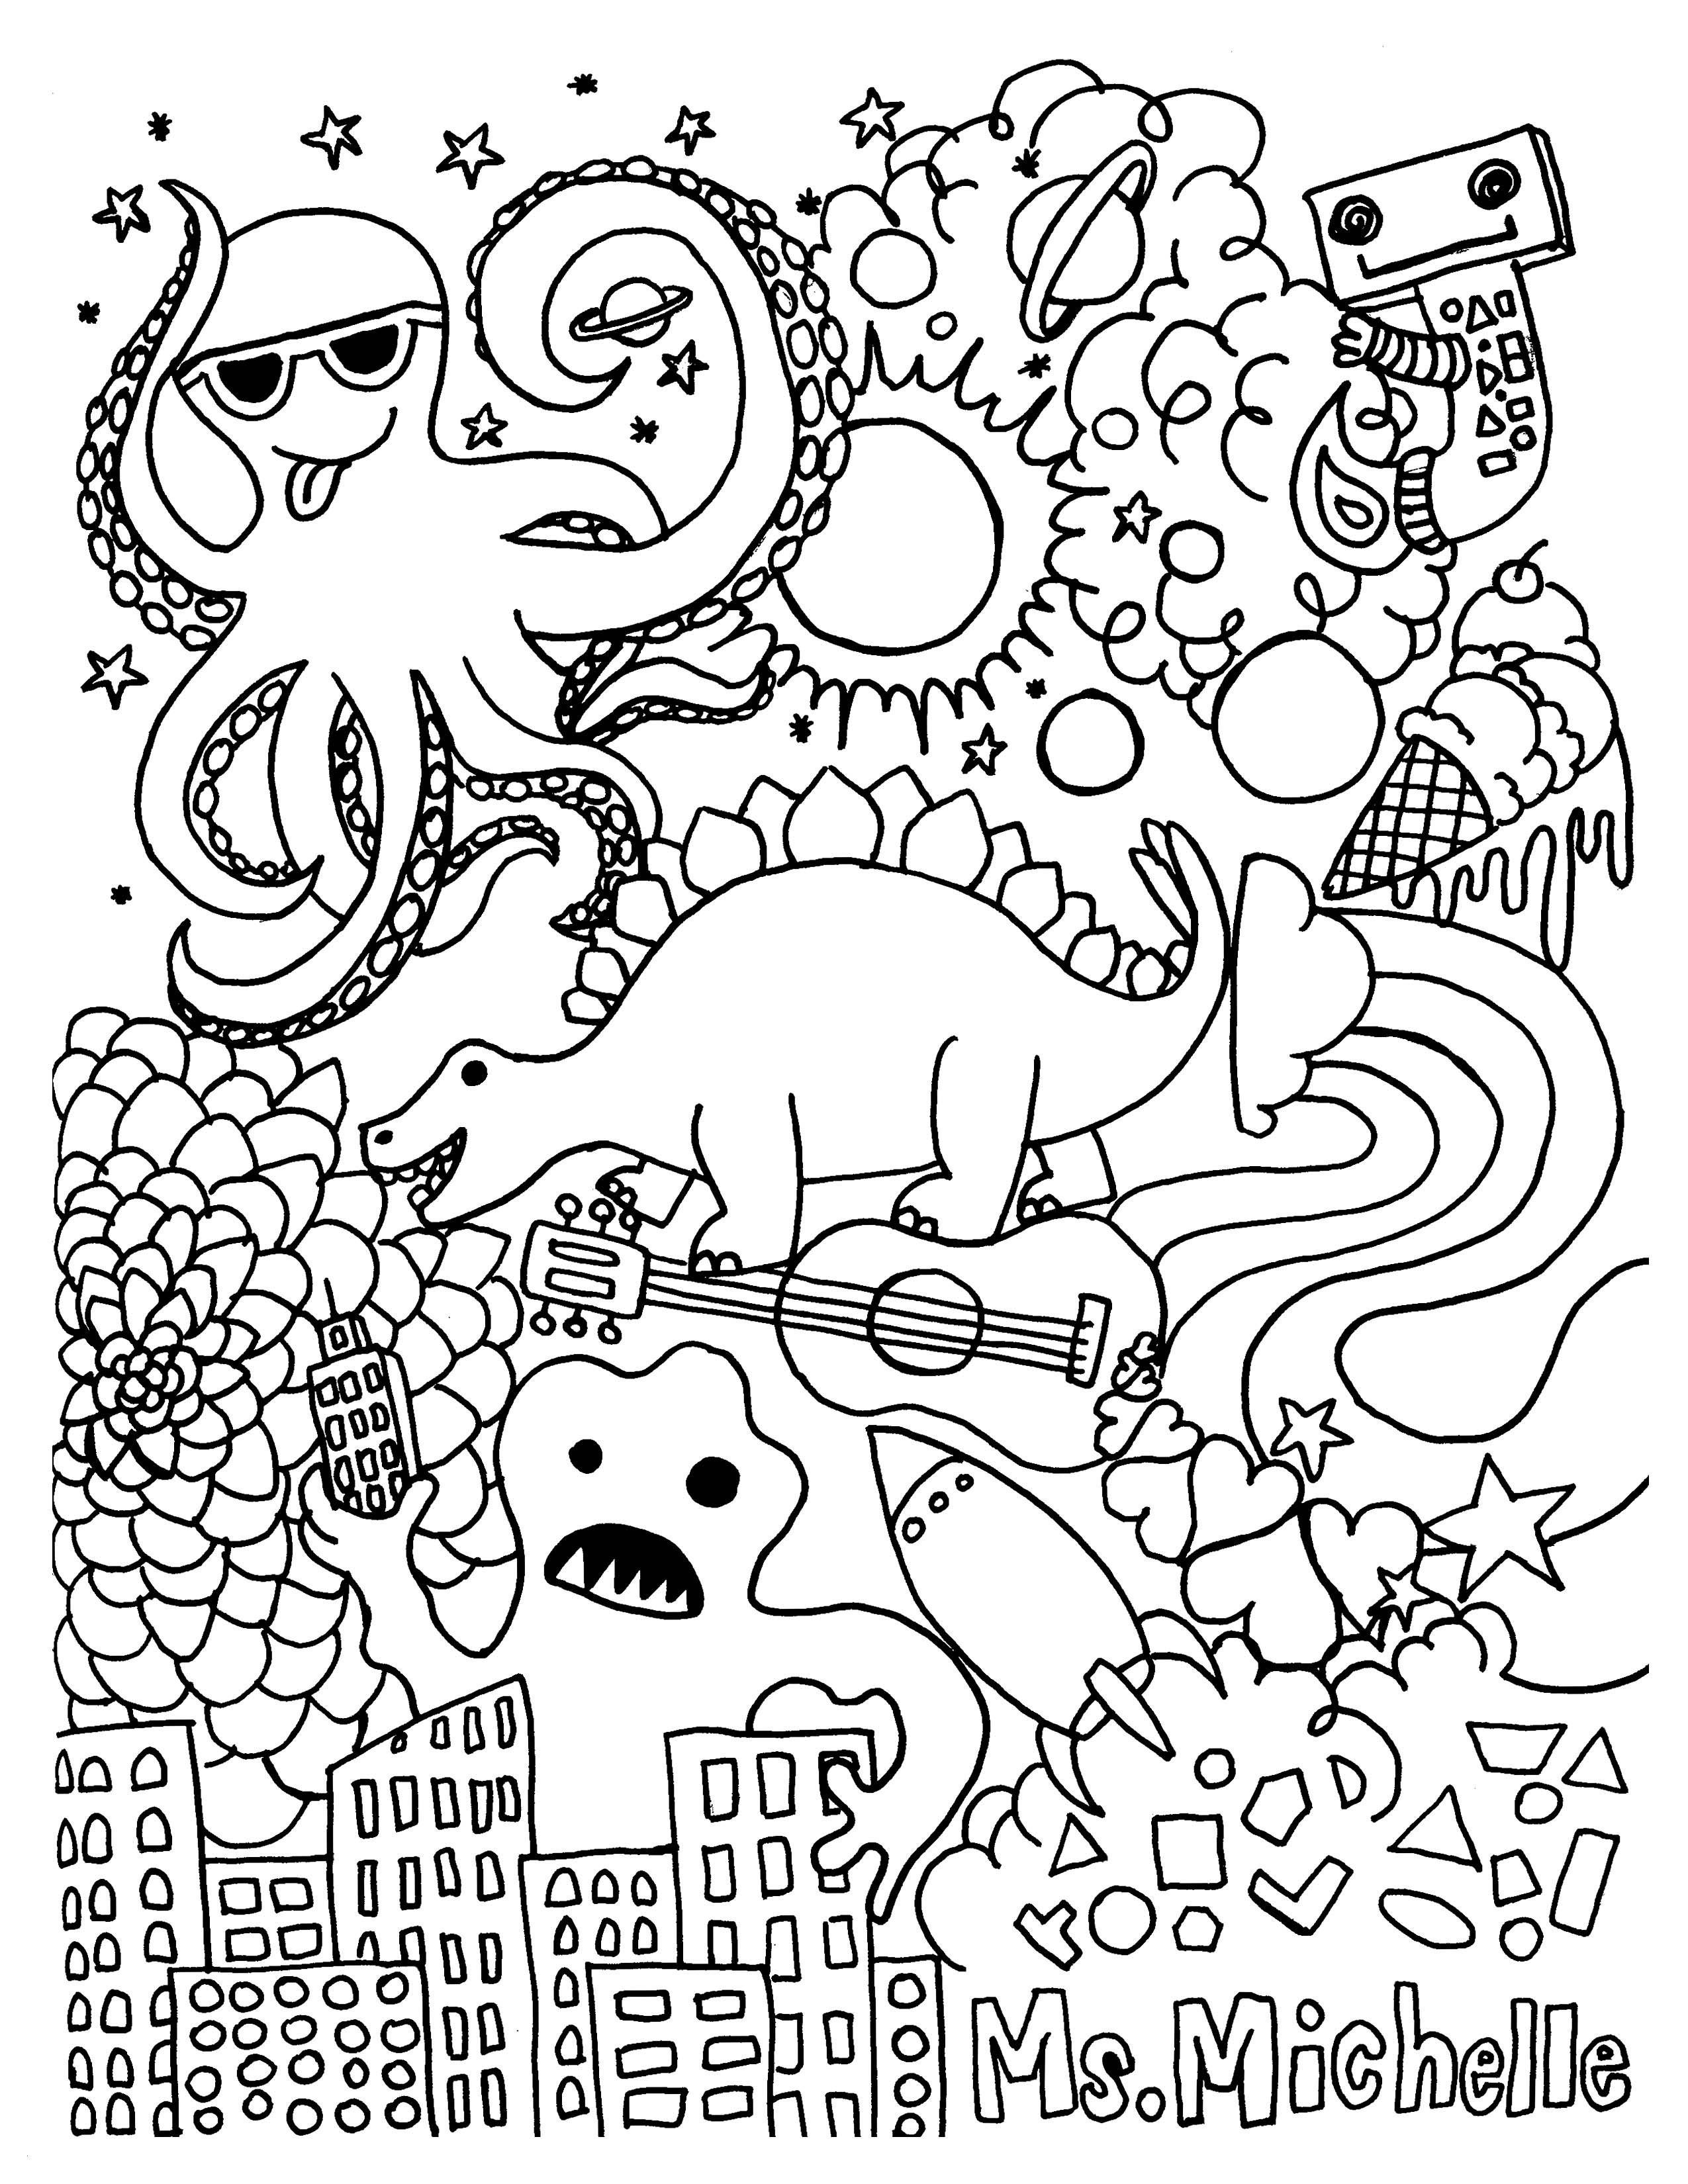 Monster High Ausmalbild Genial 14 Best Monster High Halloween Coloring Pages Pics Luxus Malvorlagen Galerie